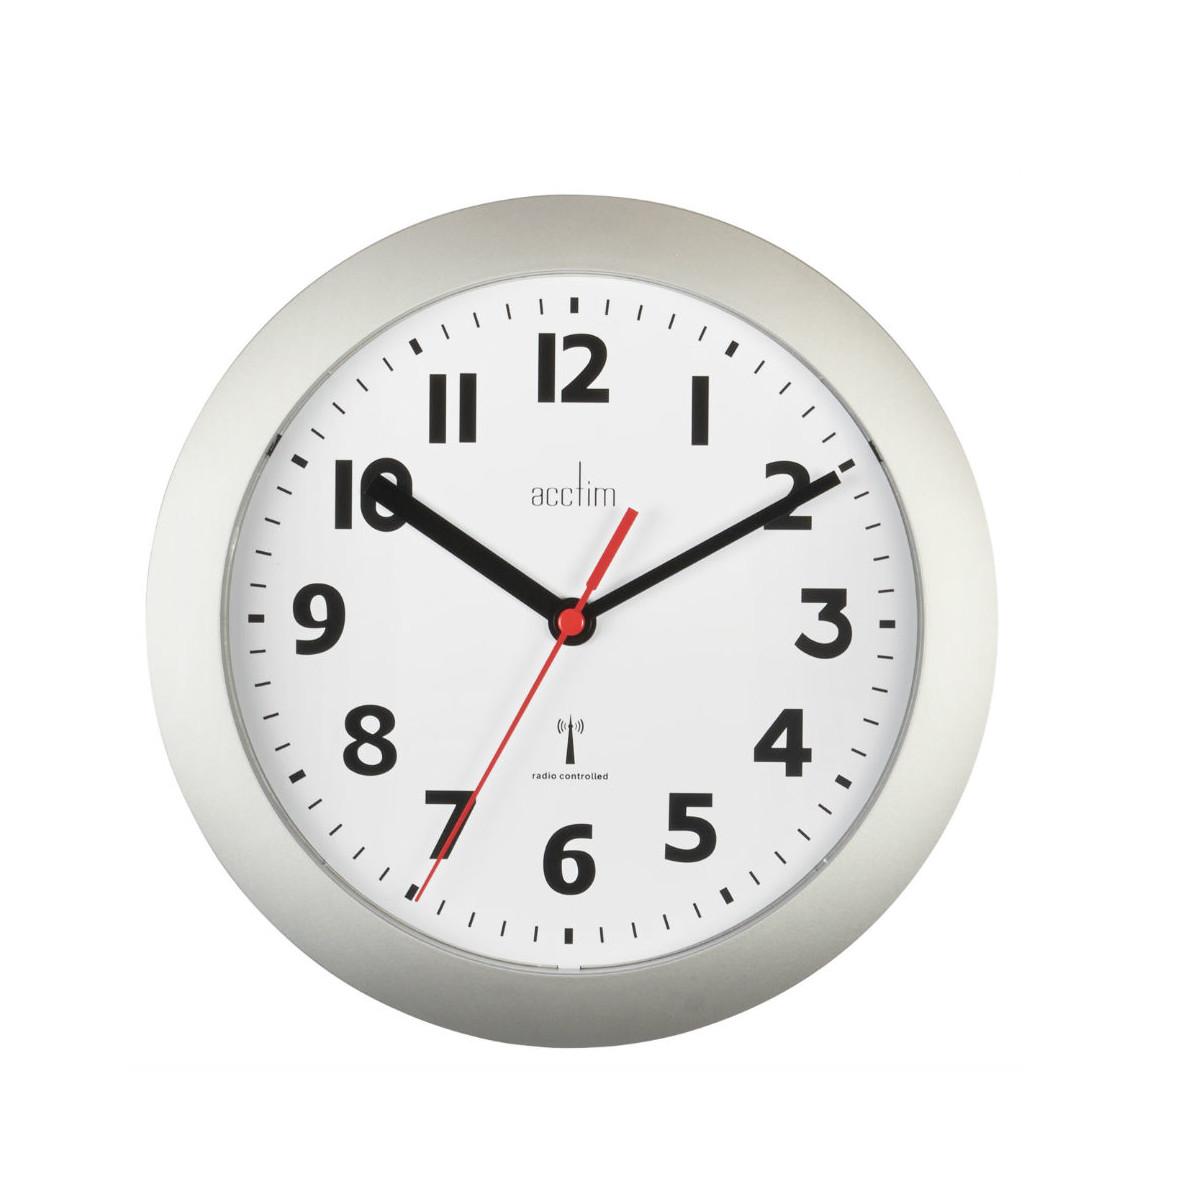 Acctim Parona Radio Controlled Silver 23cm Wall Clock Acctim Near